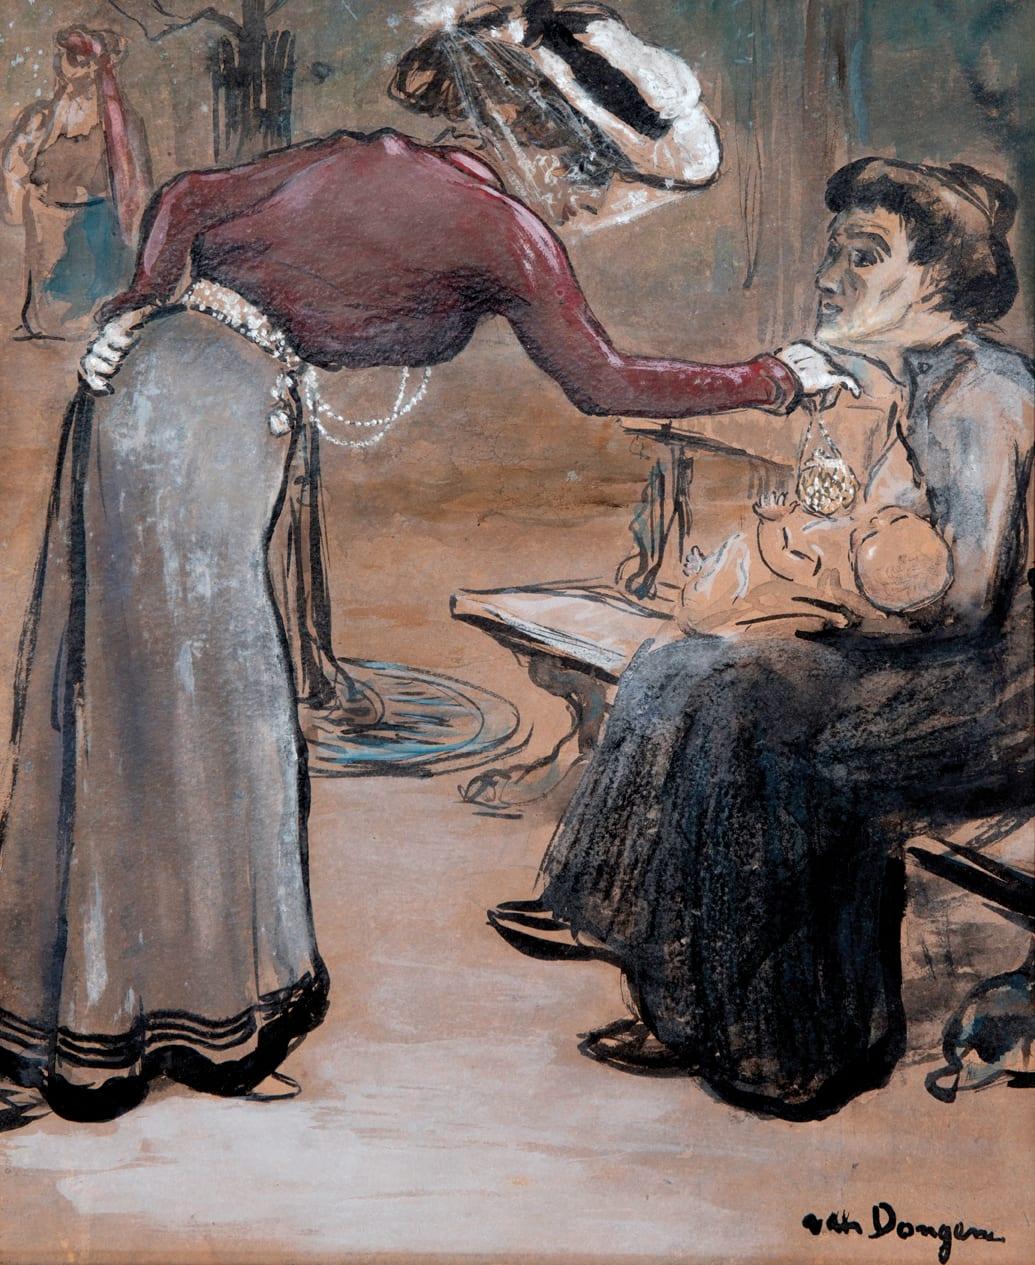 KEES VAN DONGEN, Scène de rue, circa 1902